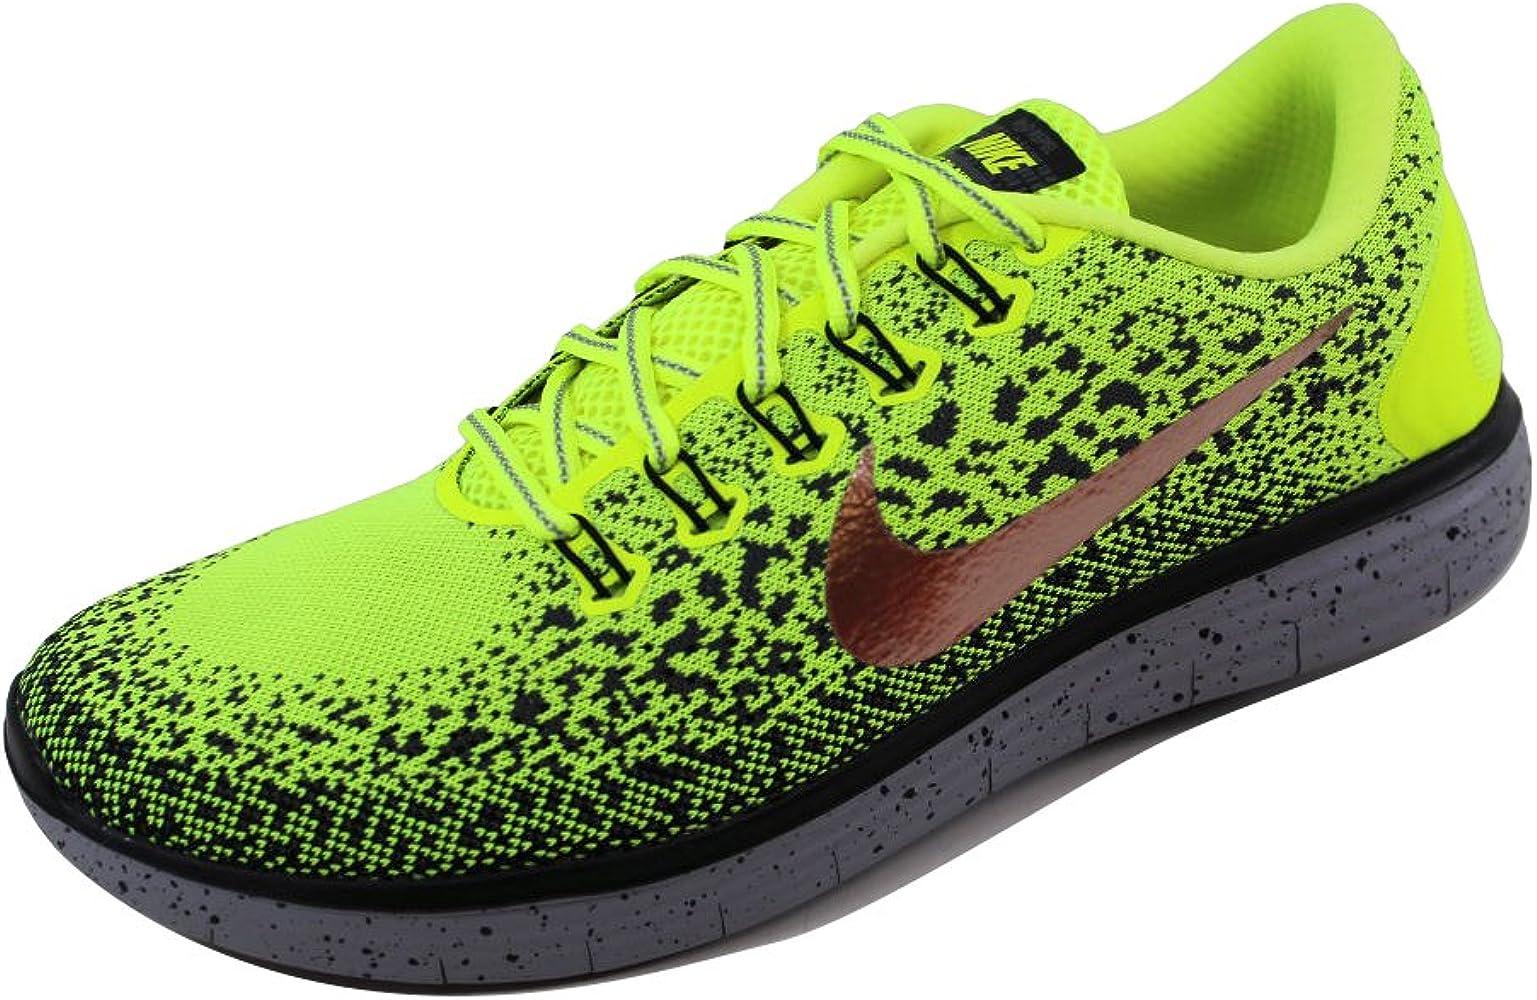 Nike 849660-700, Zapatillas de Trail Running para Hombre, Amarillo ...